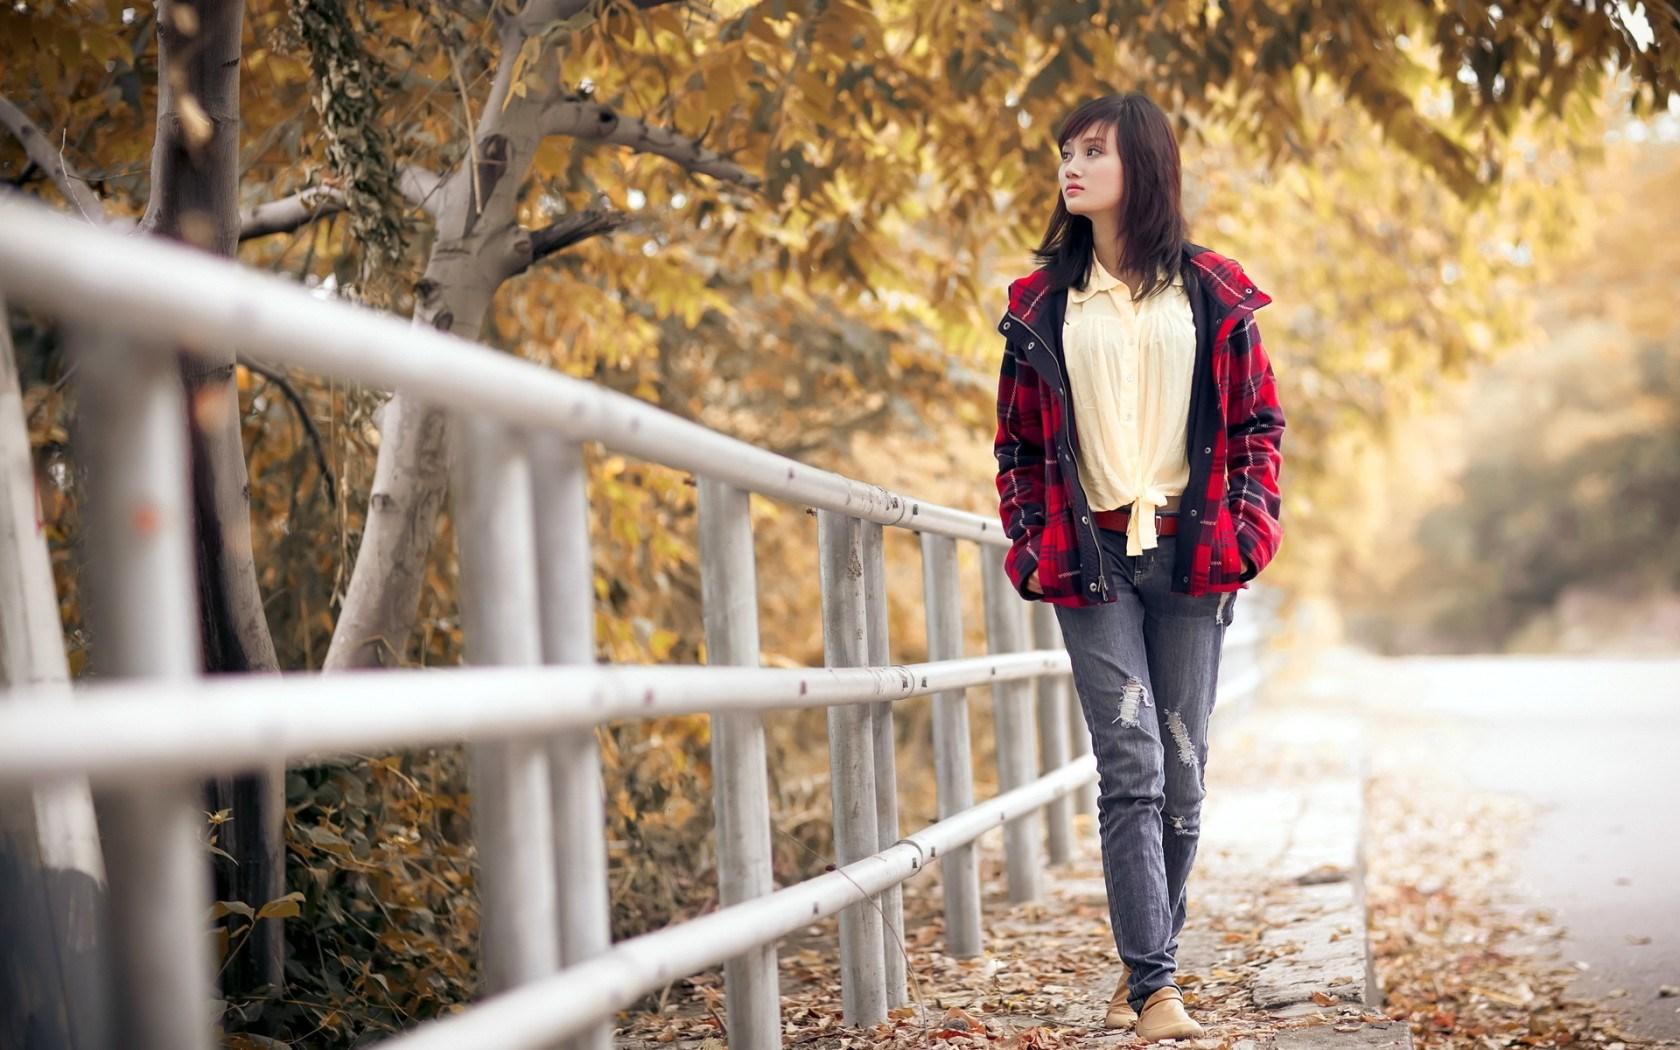 Beautiful Girl Street Autumn HD Wallpaper